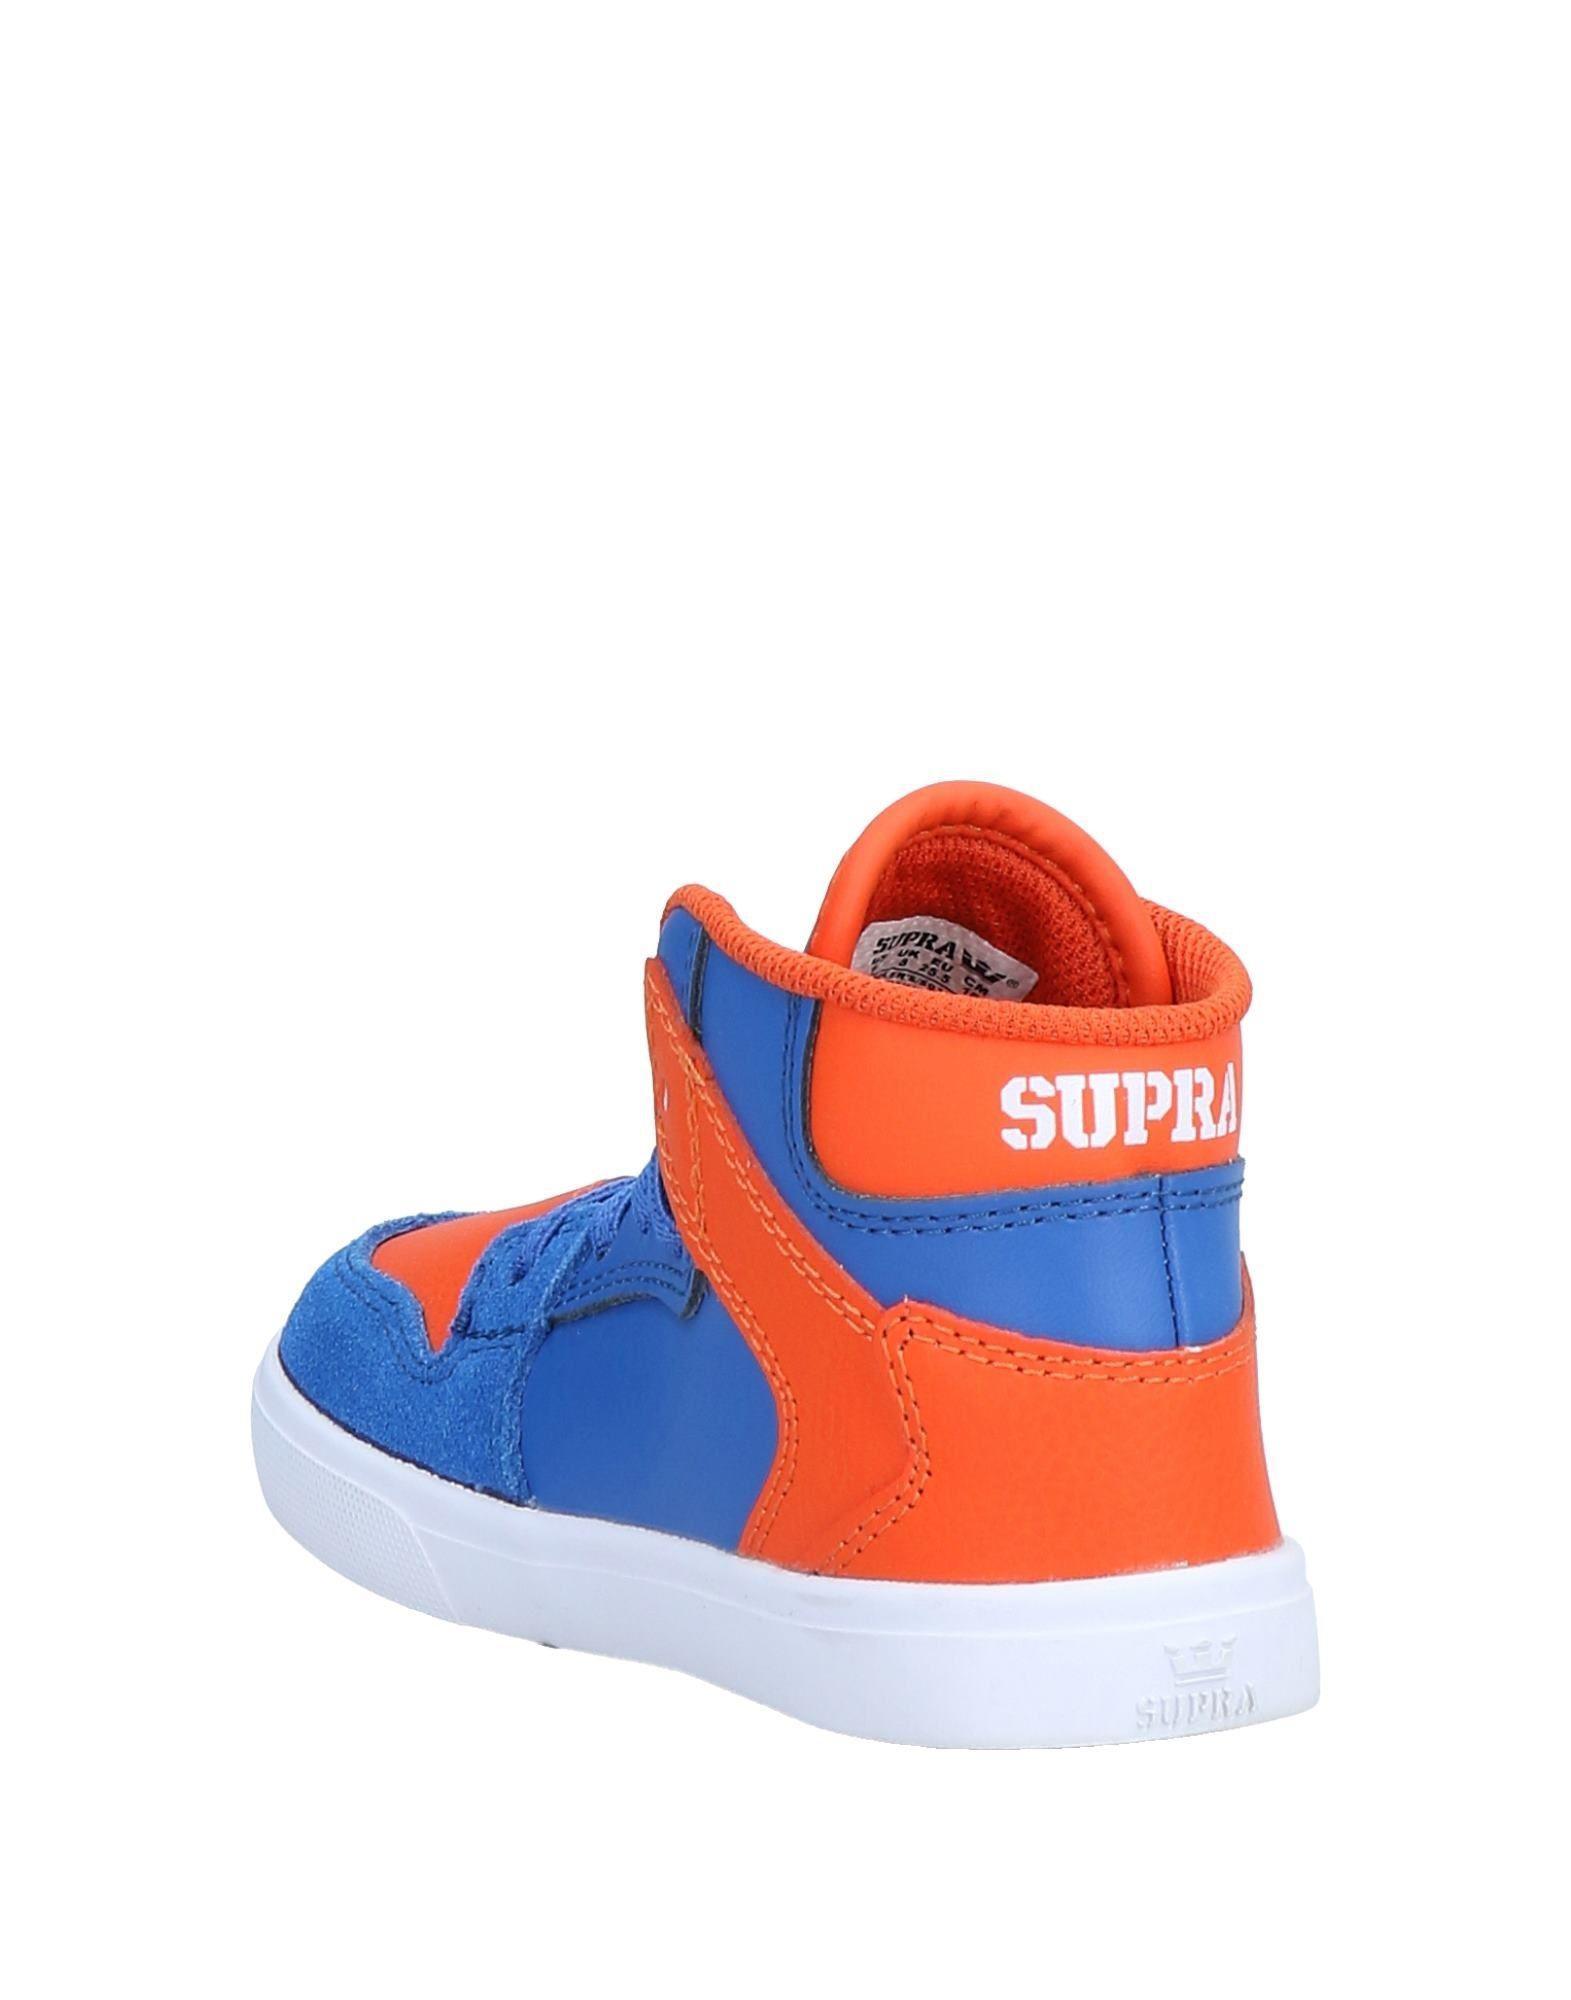 baaf079079bc Lyst - Supra High-tops   Sneakers in Blue for Men